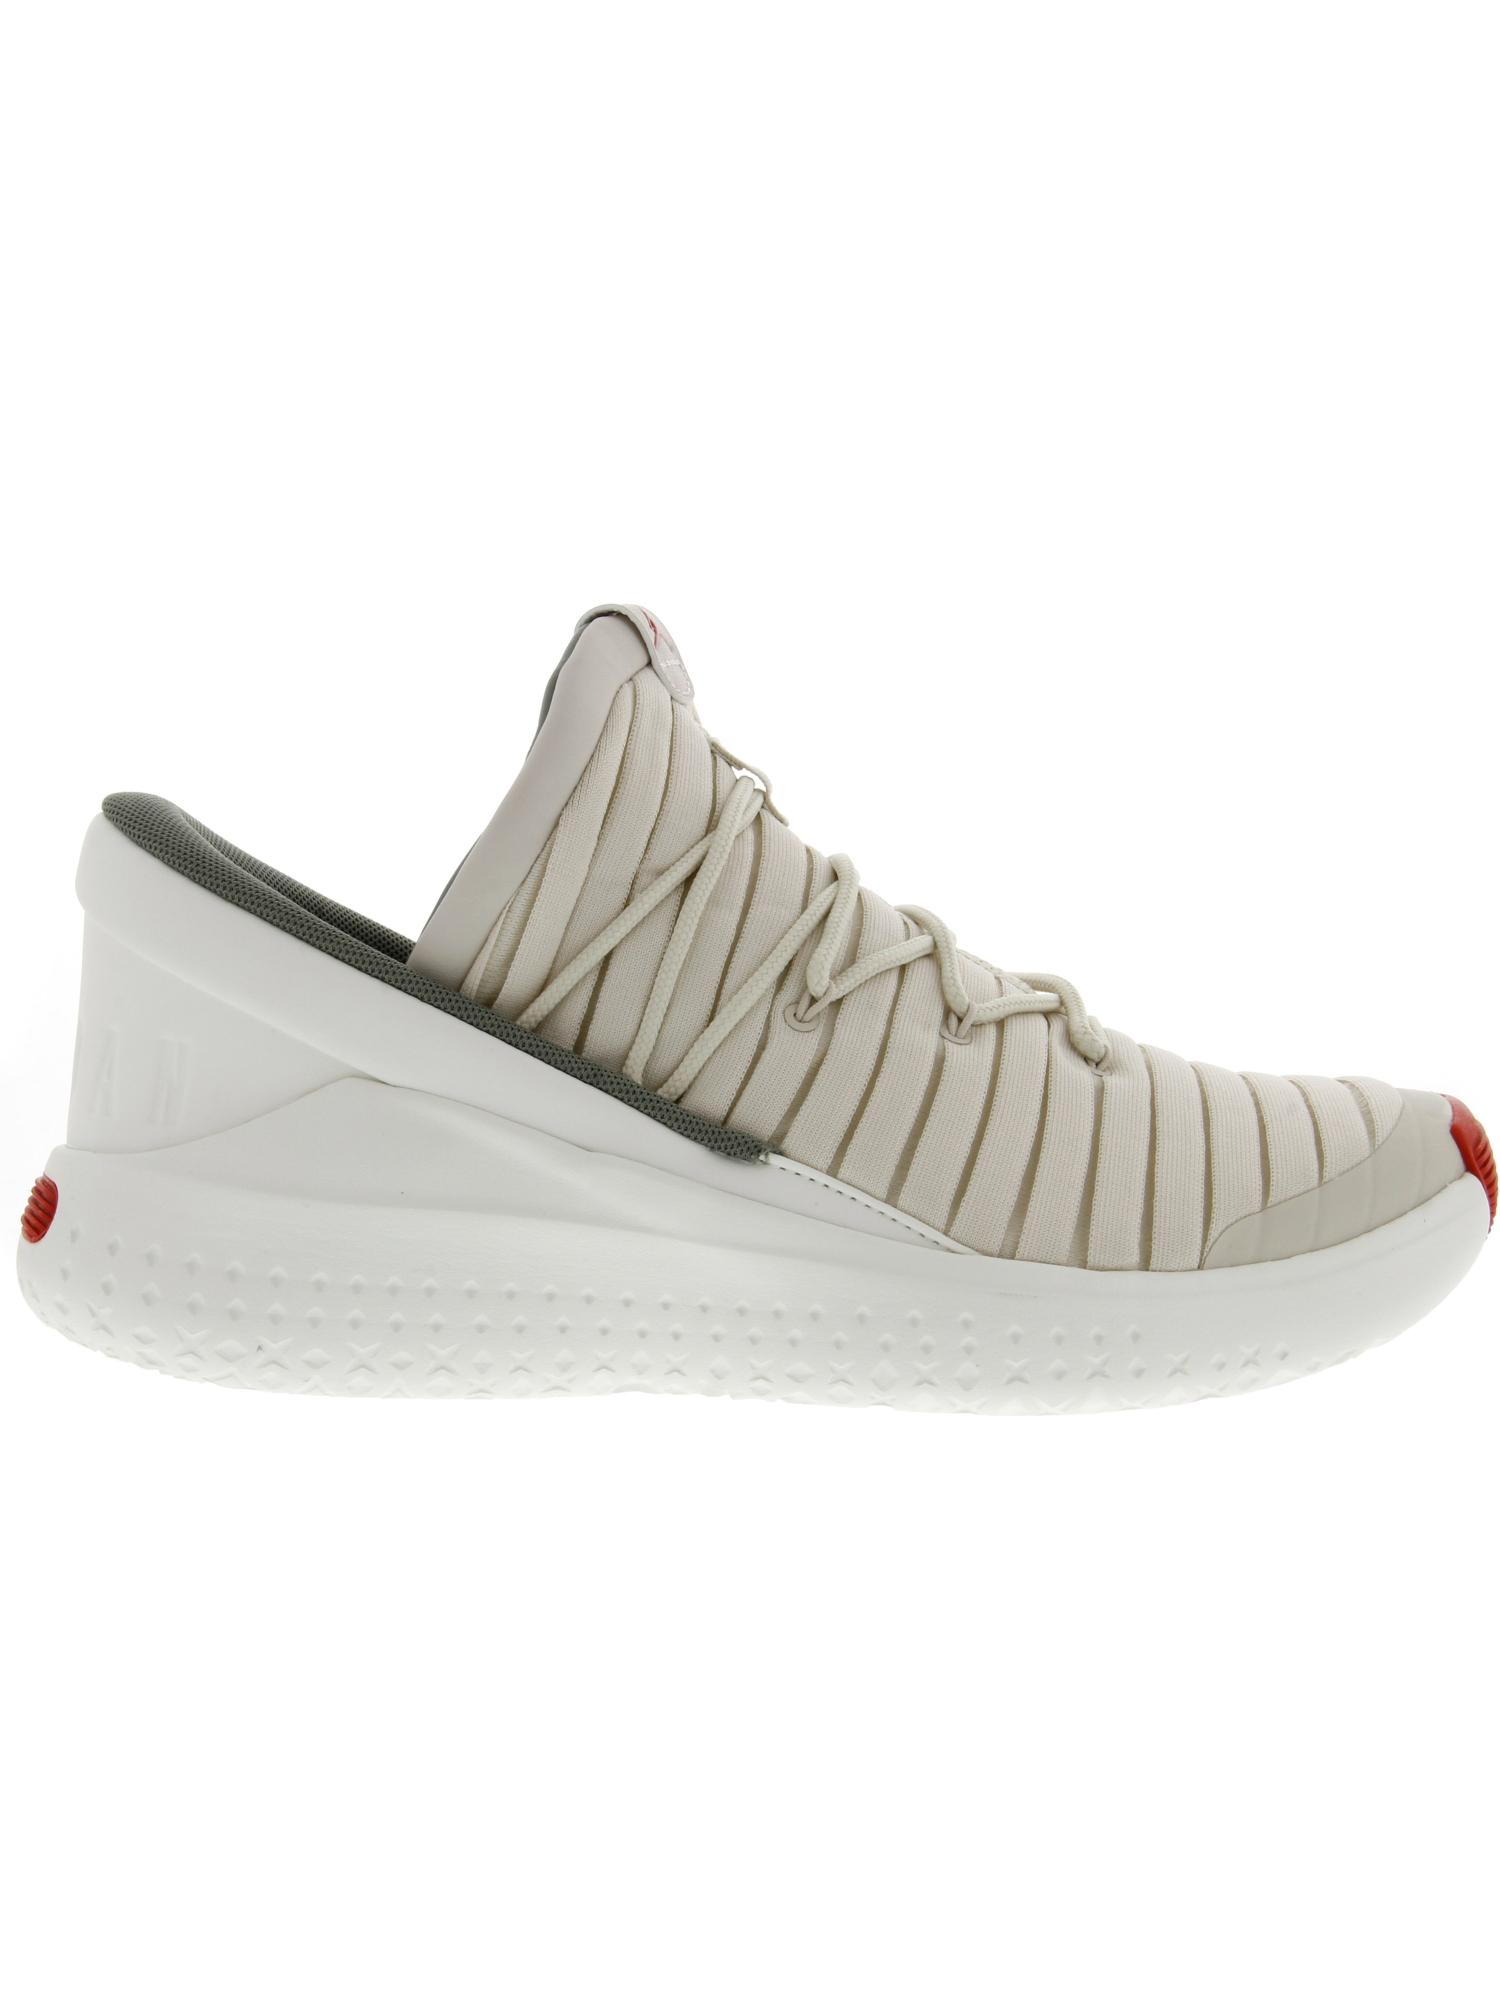 7d6cc6ae6ab7 Nike Men s Jordan Flight Luxe Ankle-High Fabric Basketball Shoe